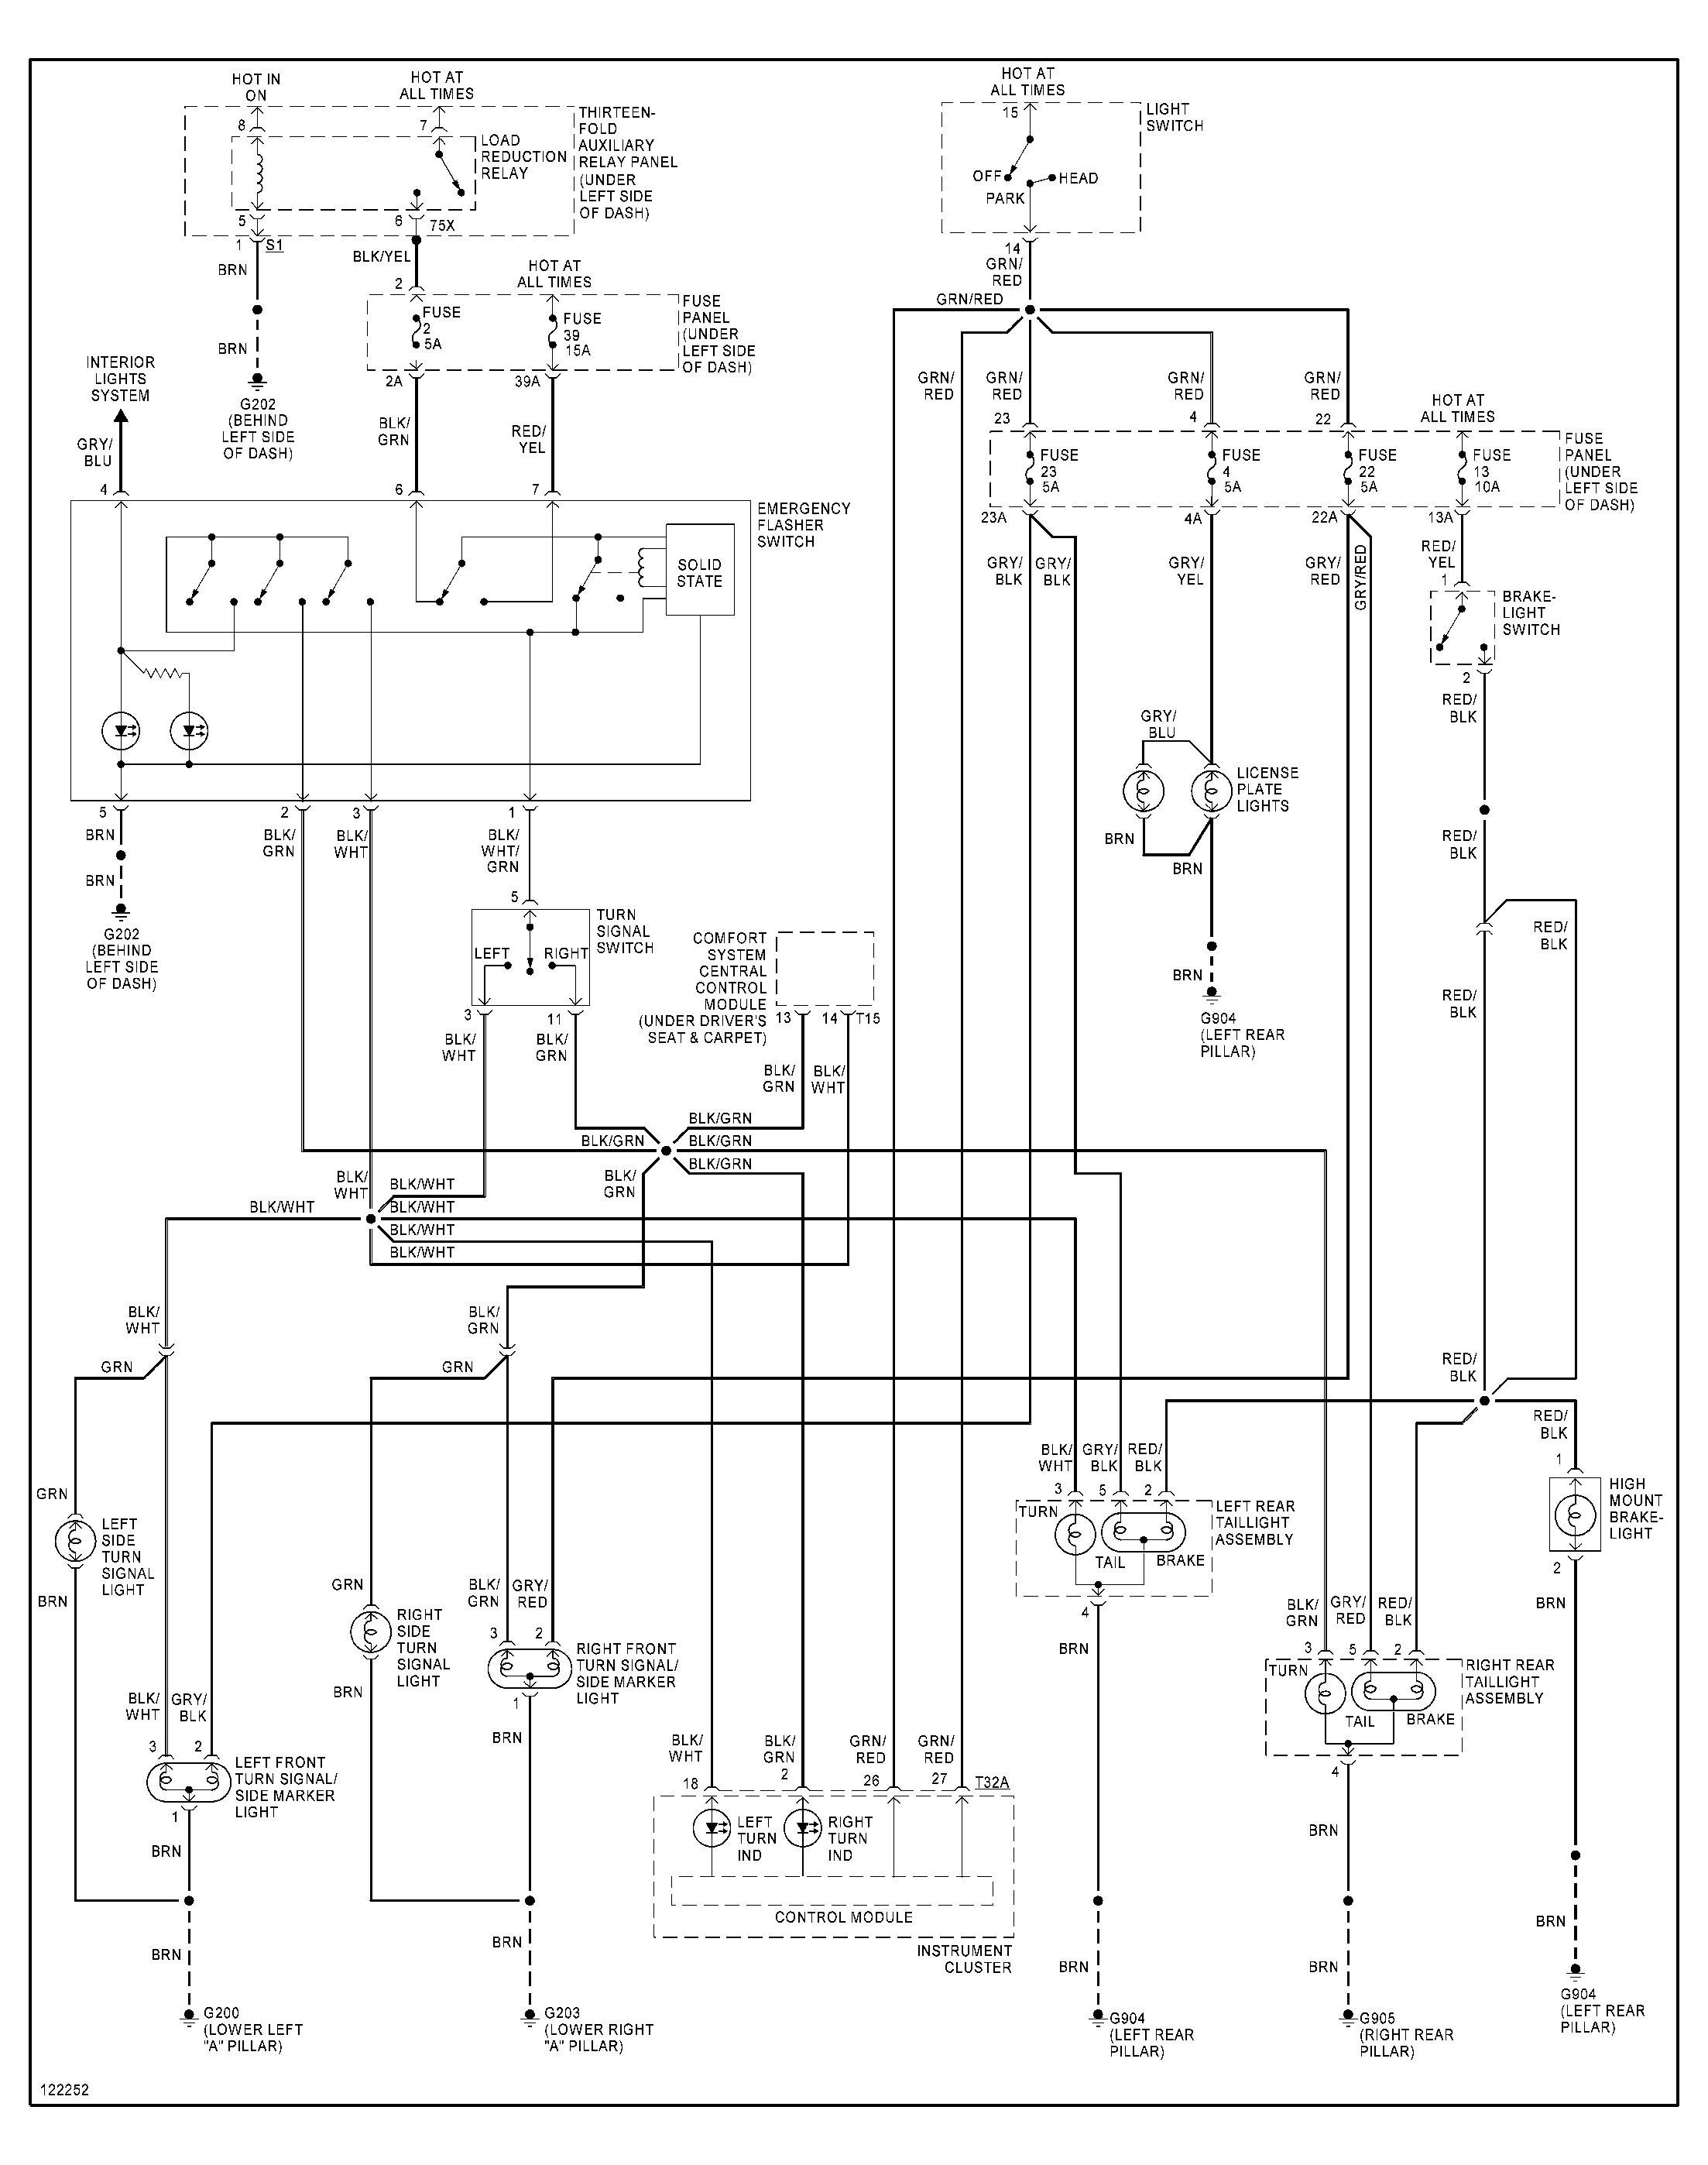 2003 vw jetta monsoon stereo wiring hn 9388  radio wiring diagram jetta free diagram  hn 9388  radio wiring diagram jetta